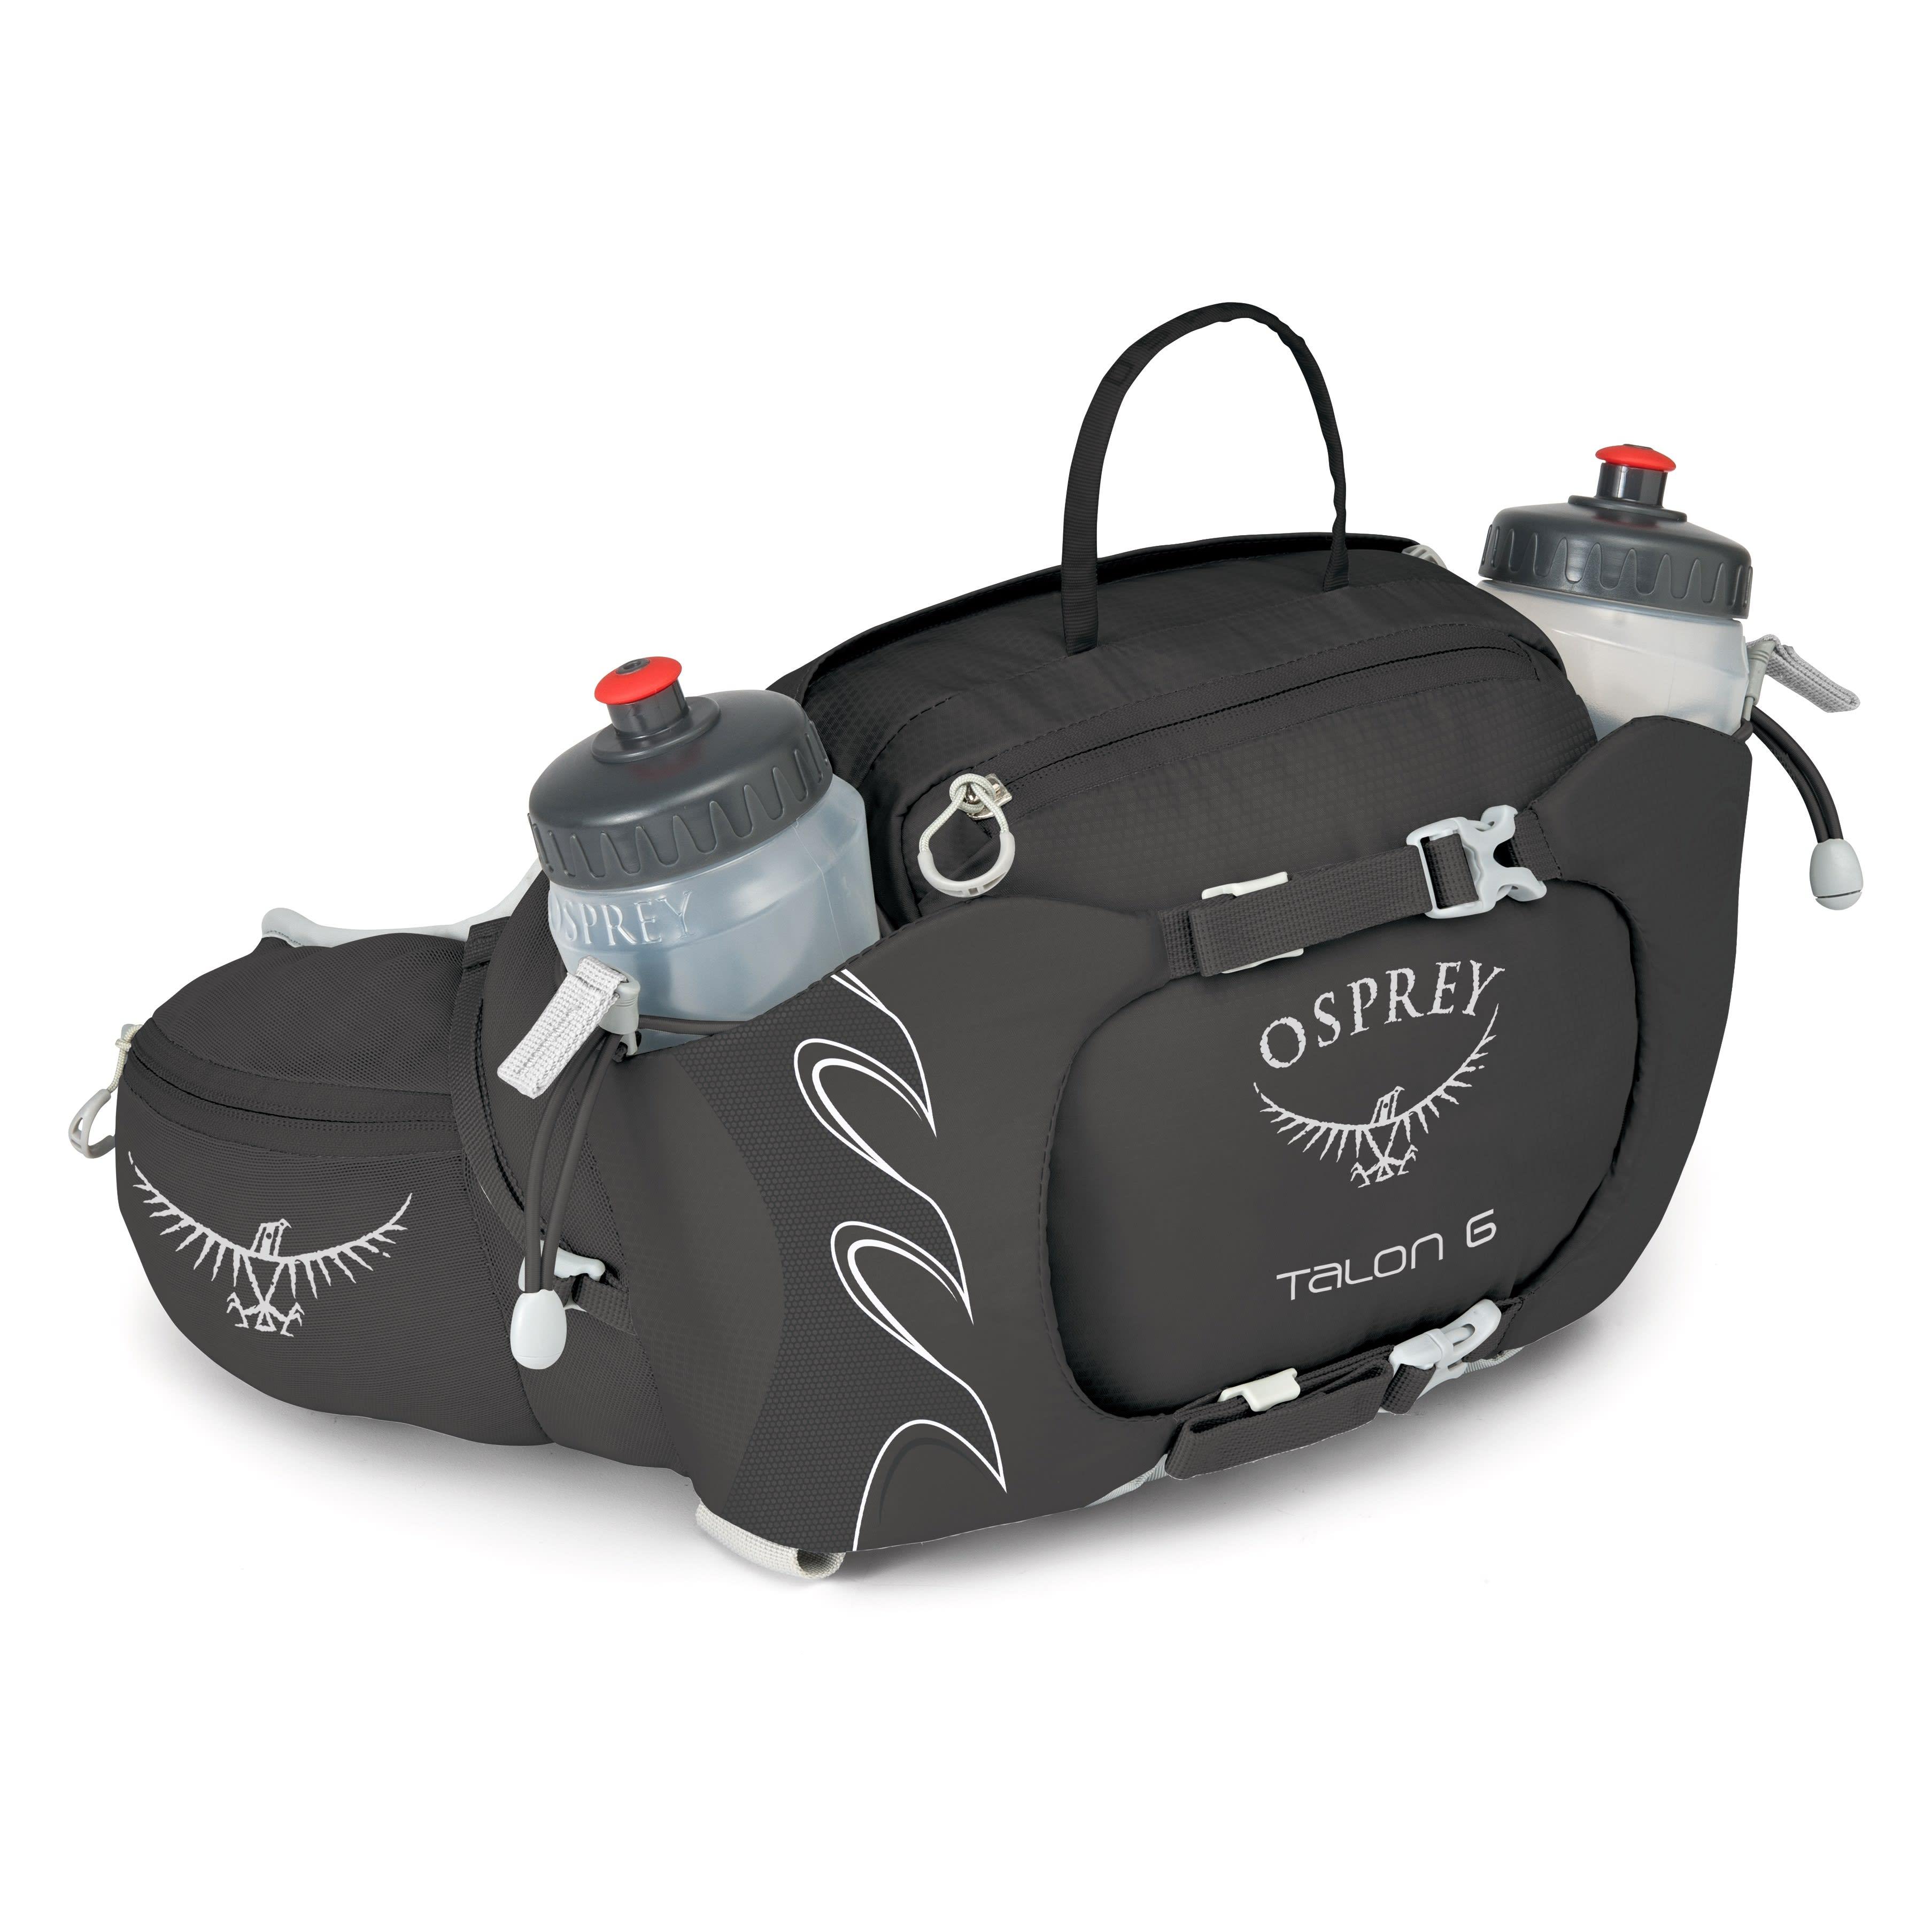 Talon 6, Osprey